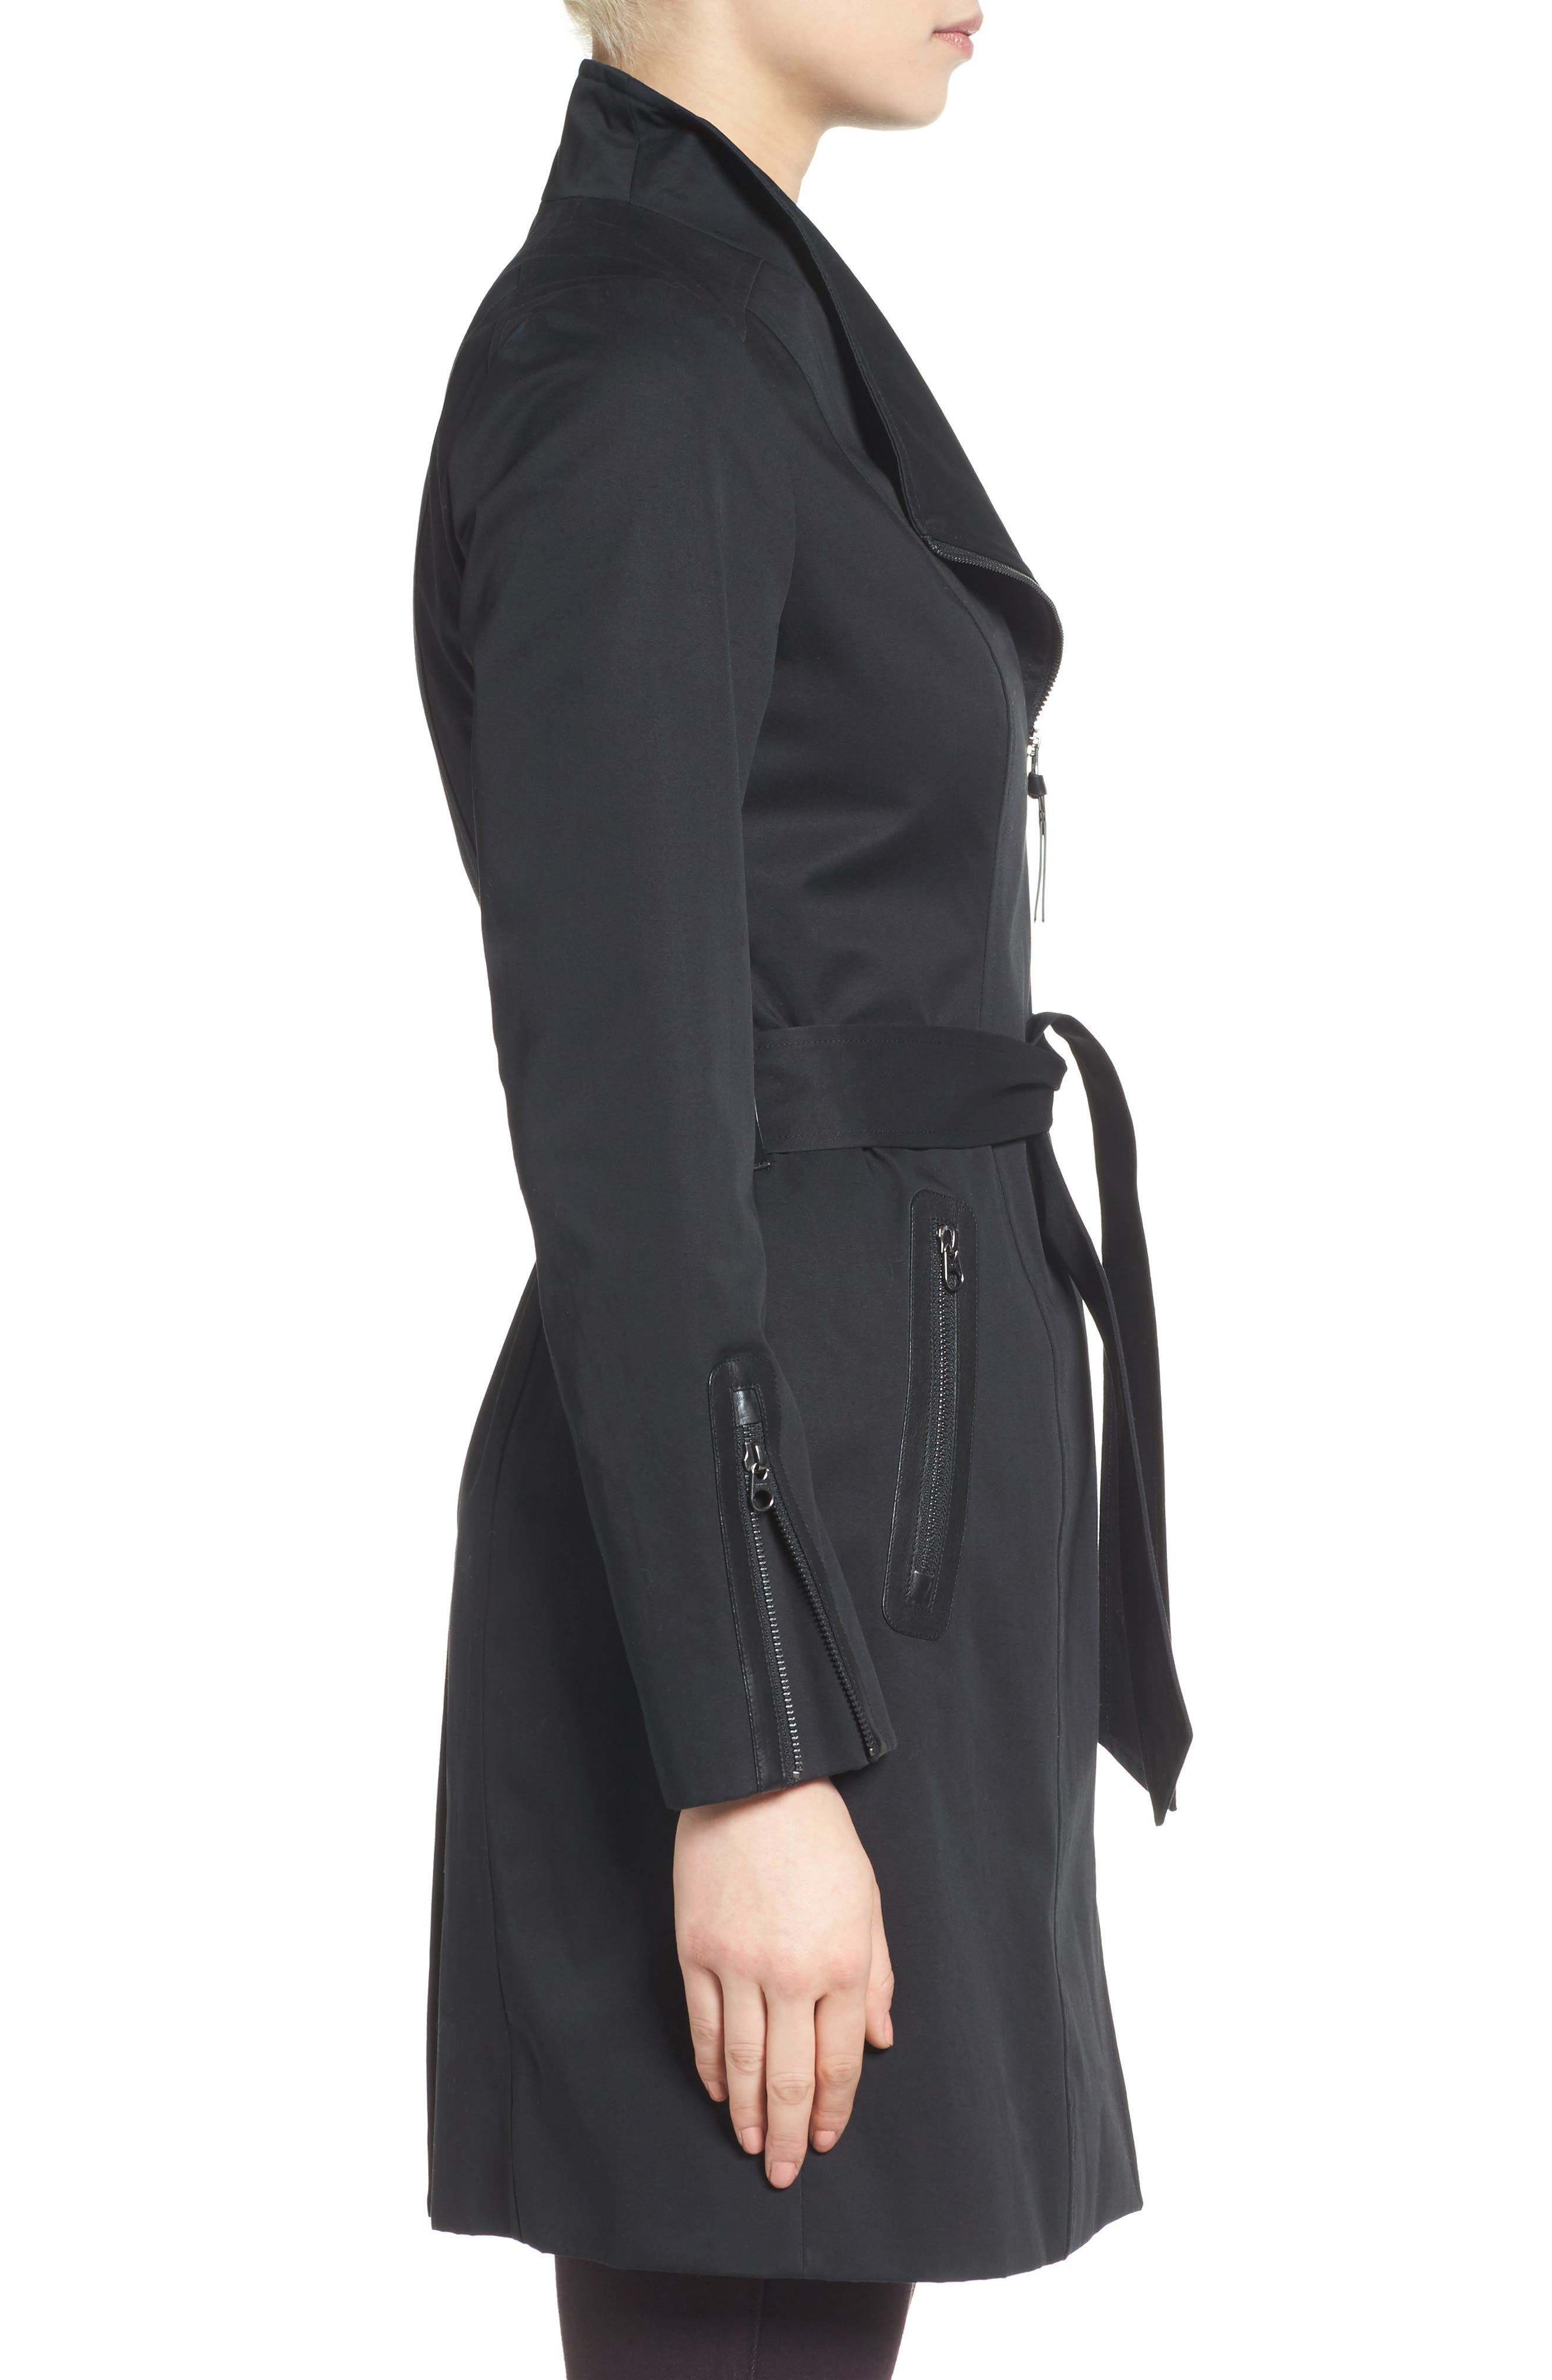 MACKAGE, Estela Belted Long Trench Coat, Alternate thumbnail 3, color, 001